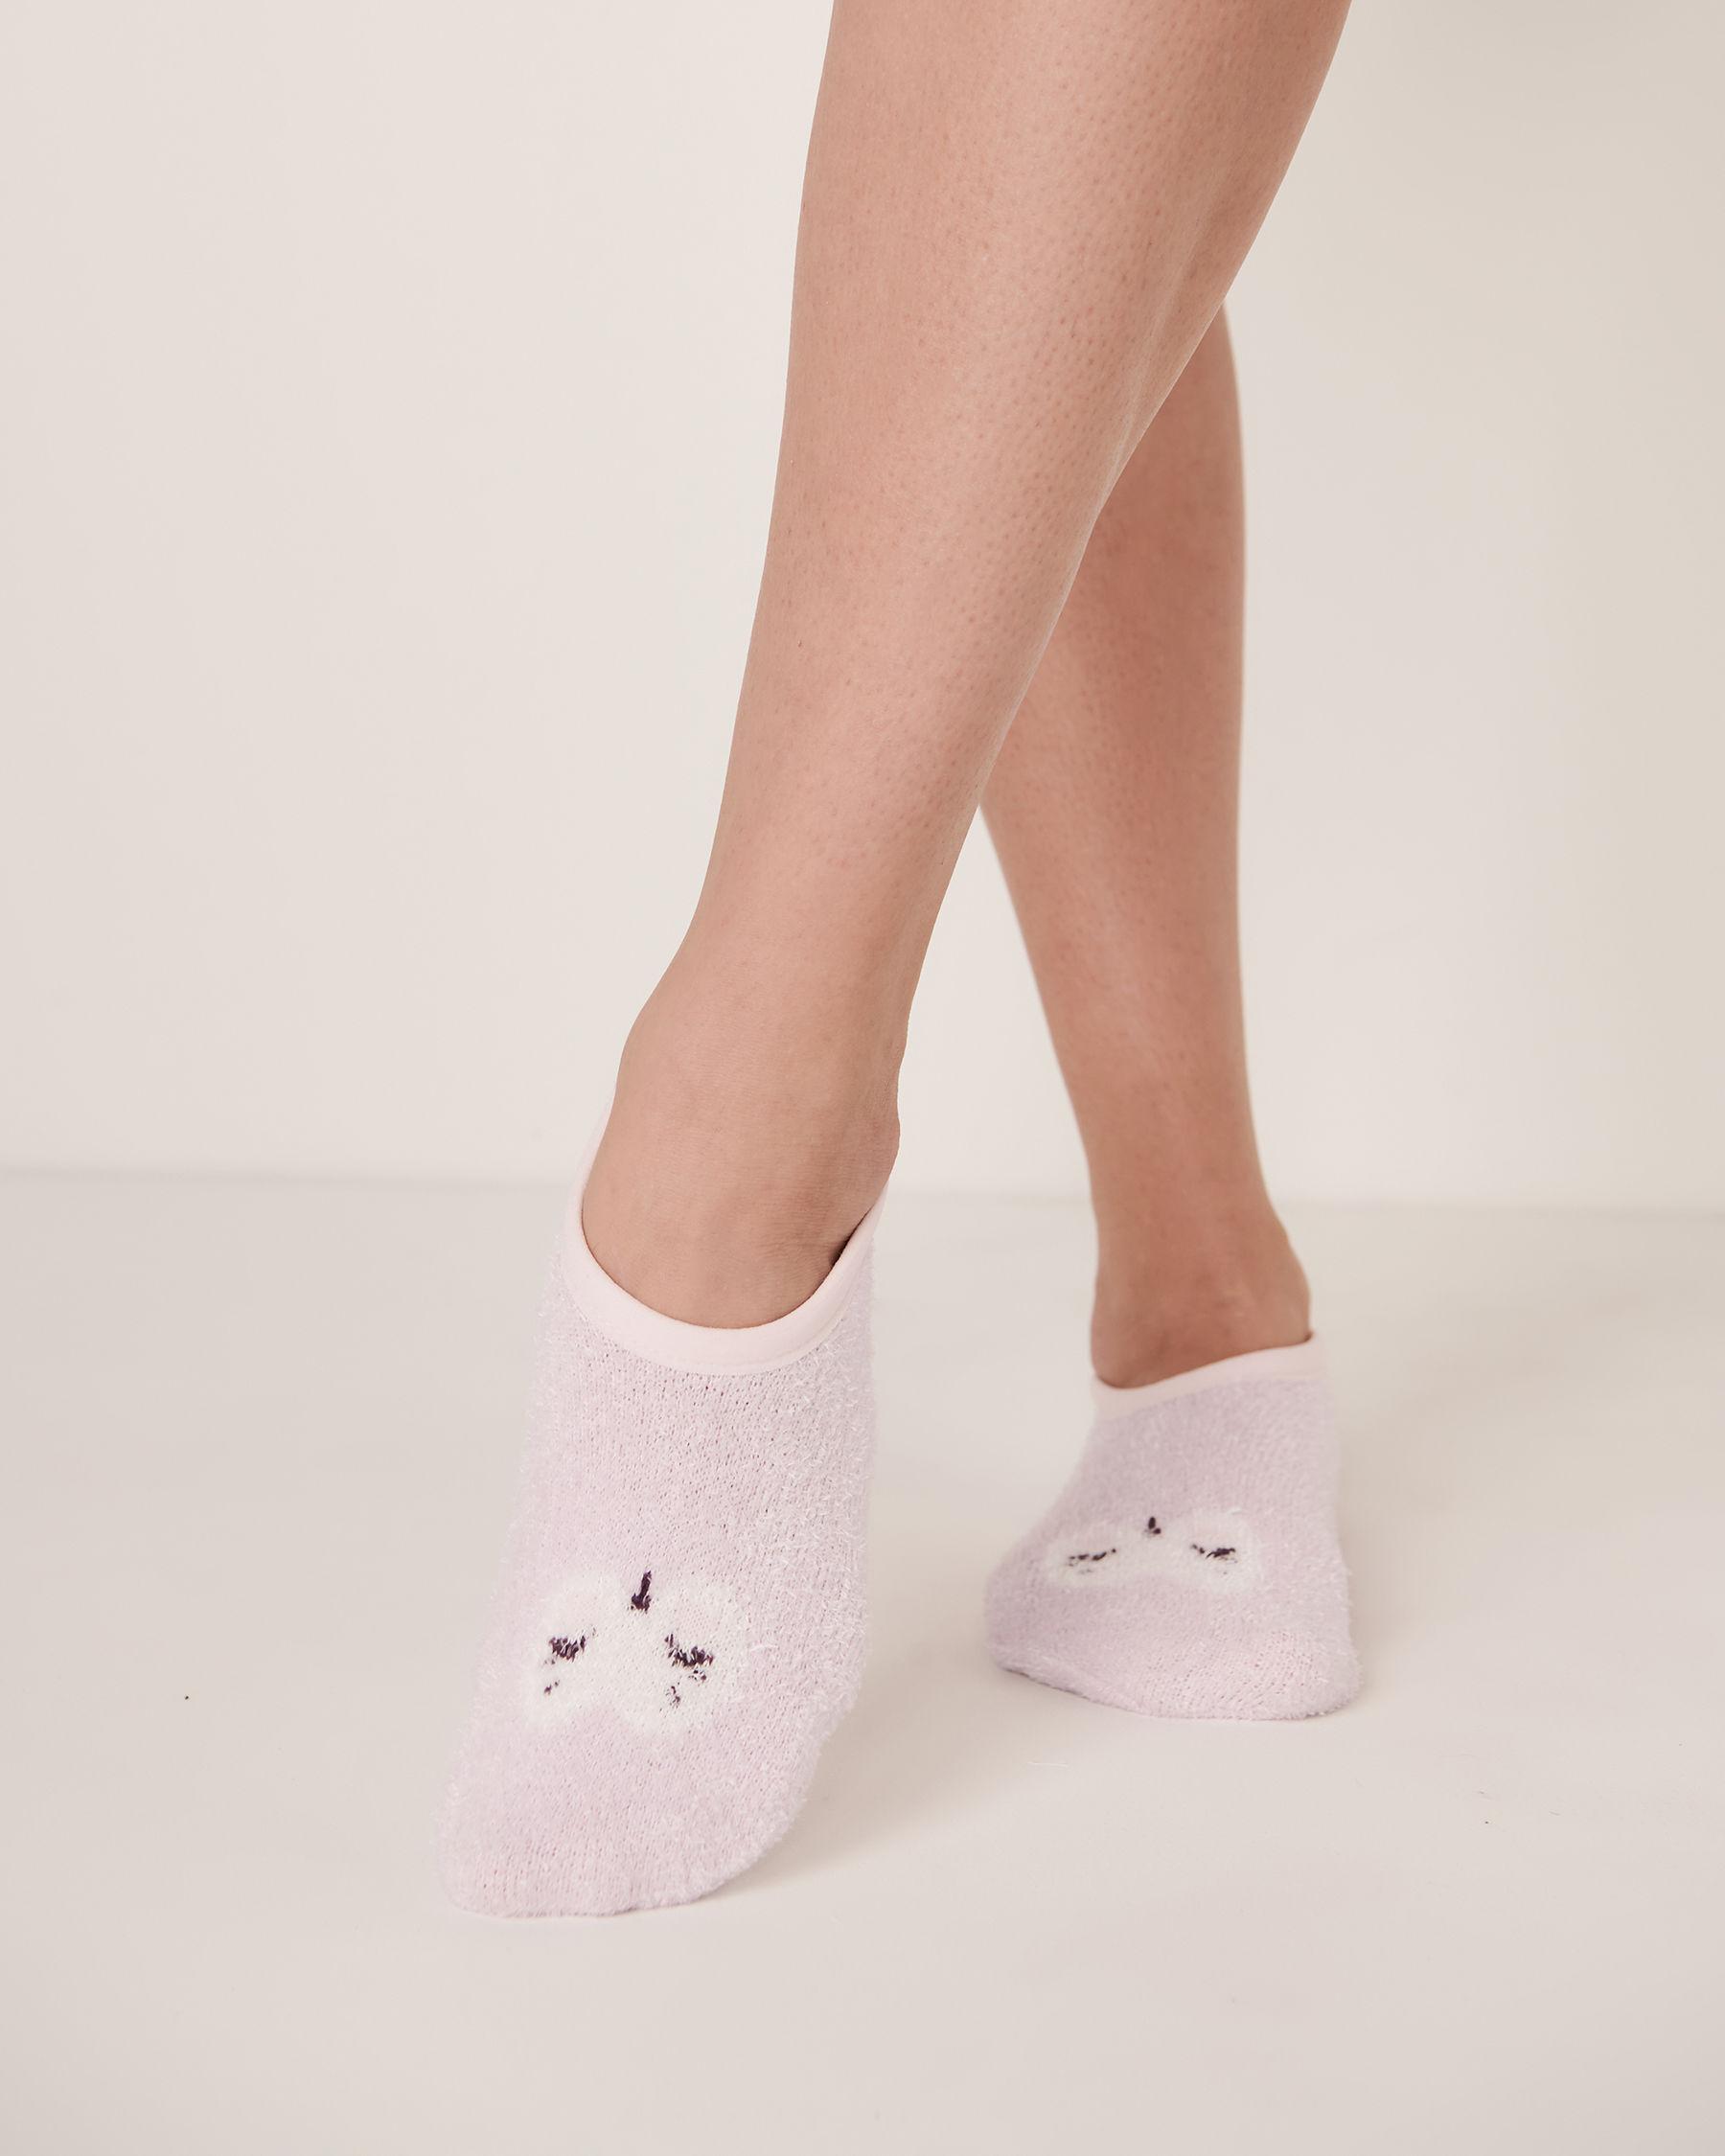 LA VIE EN ROSE Chenille Slipper Socks Lilac 40700015 - View1